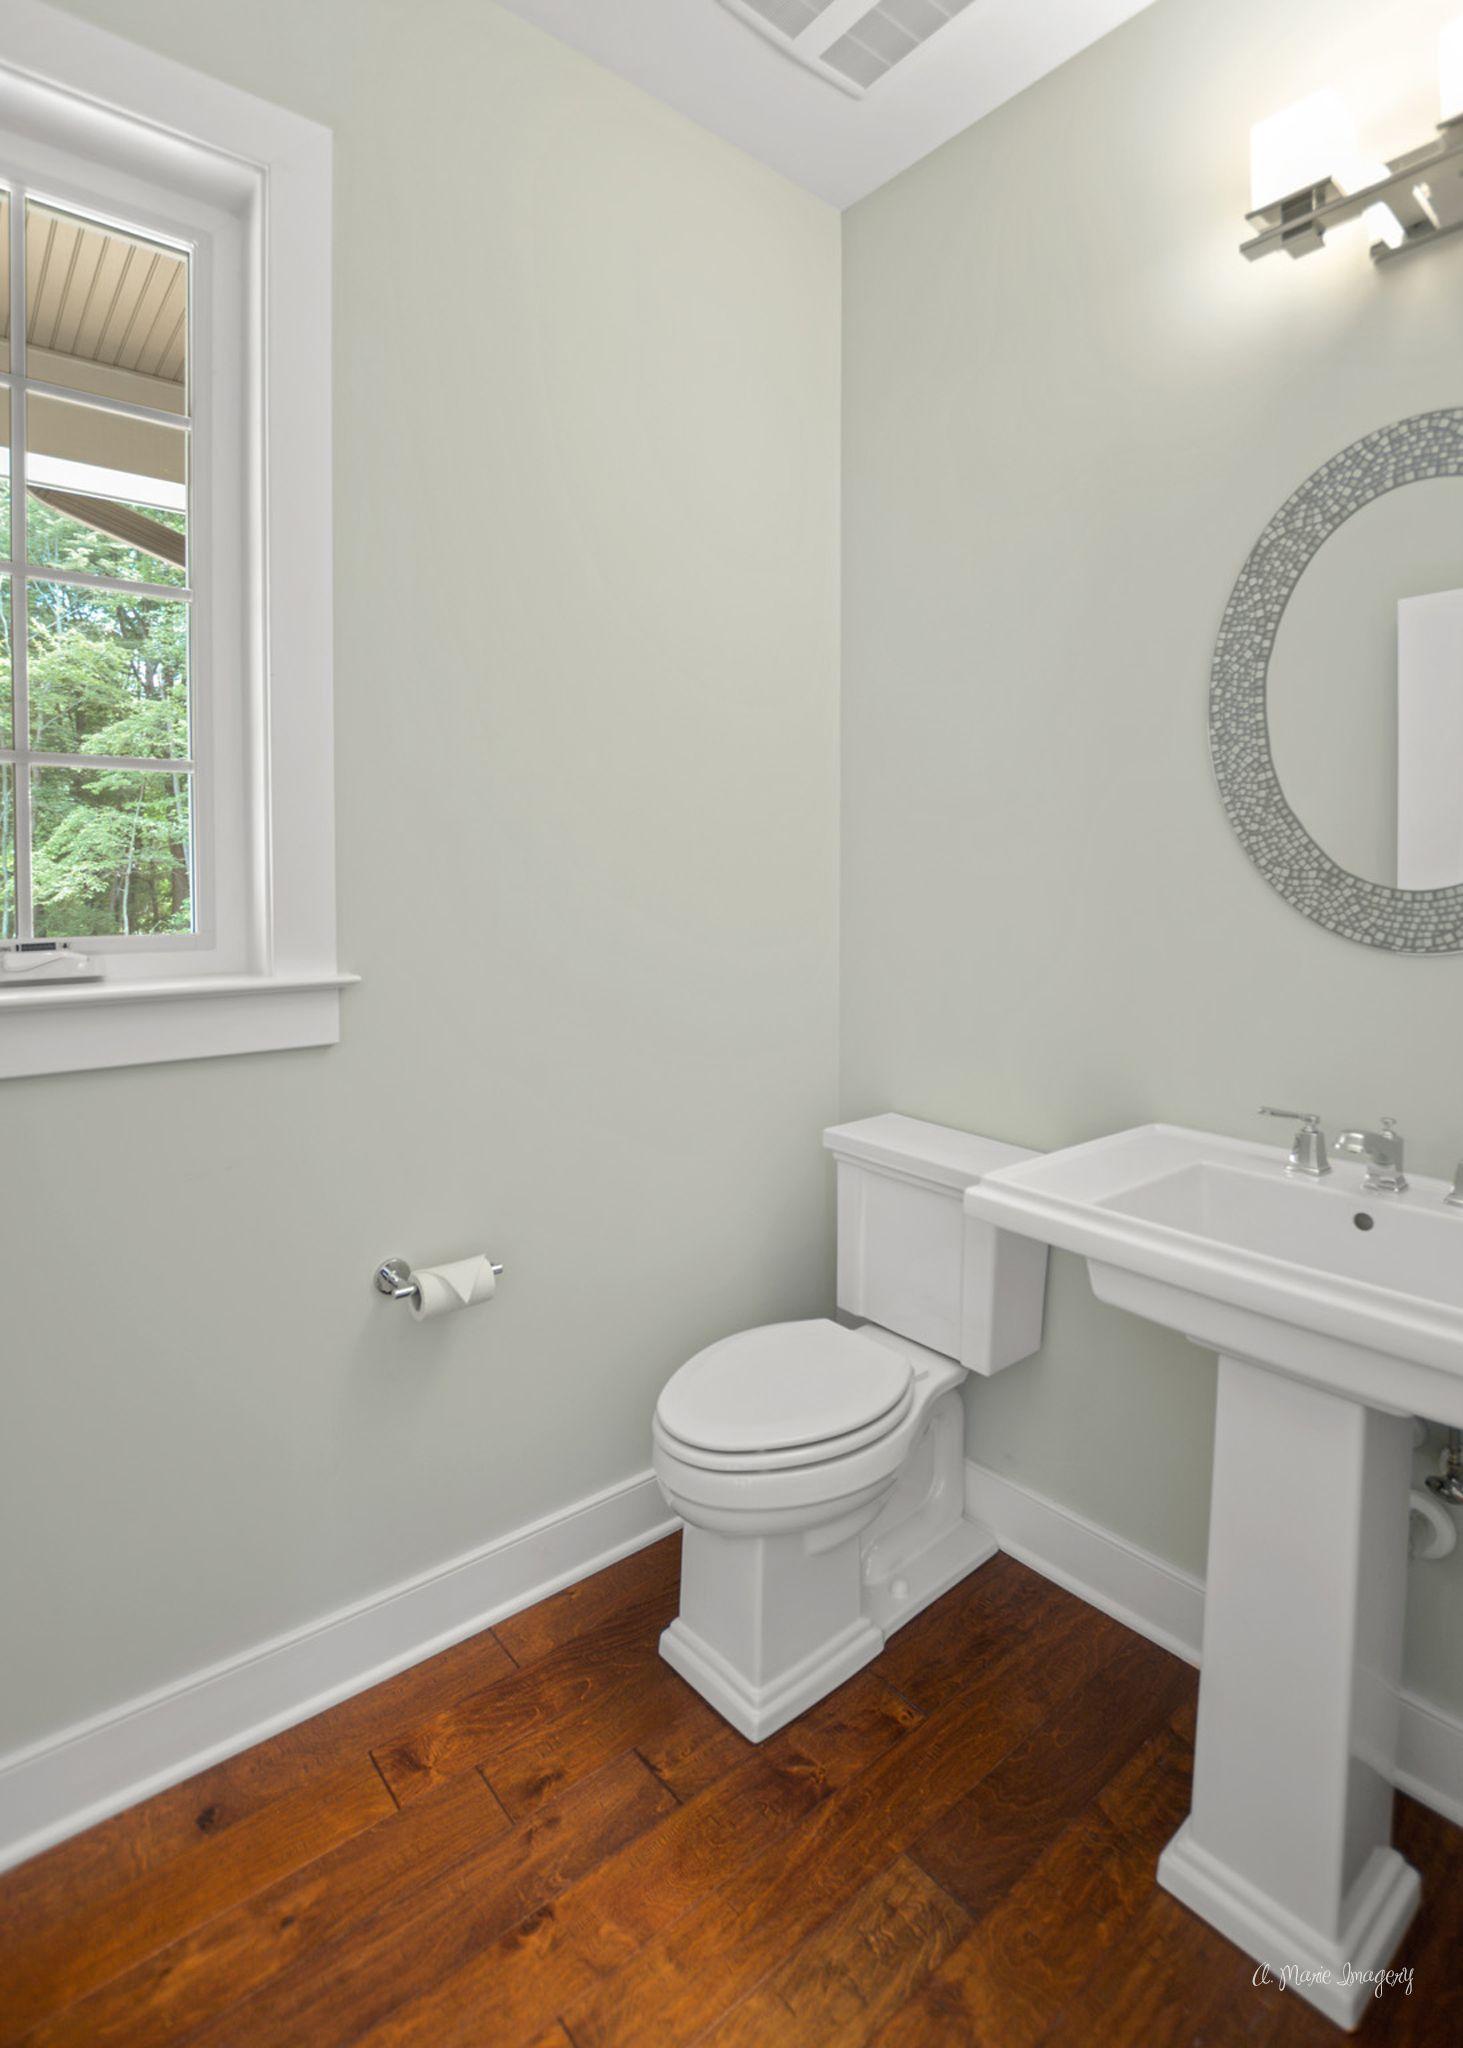 An Elegant Pedestal Sink And Matching Toilet Bring A Powder Room